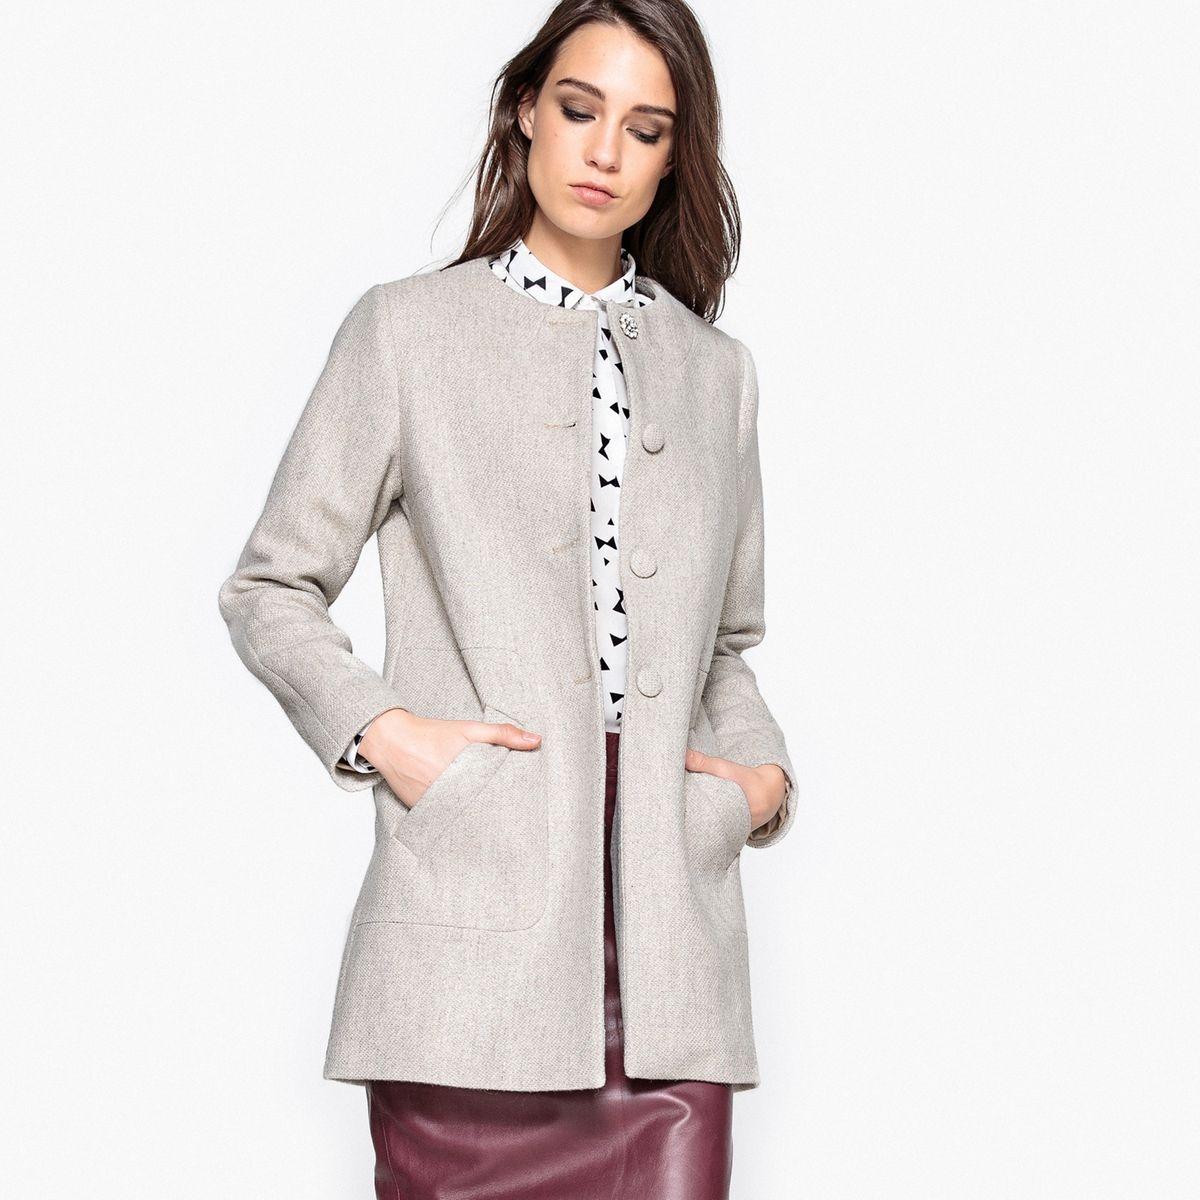 manteau femme ronde jusqu 89 pureshopping. Black Bedroom Furniture Sets. Home Design Ideas